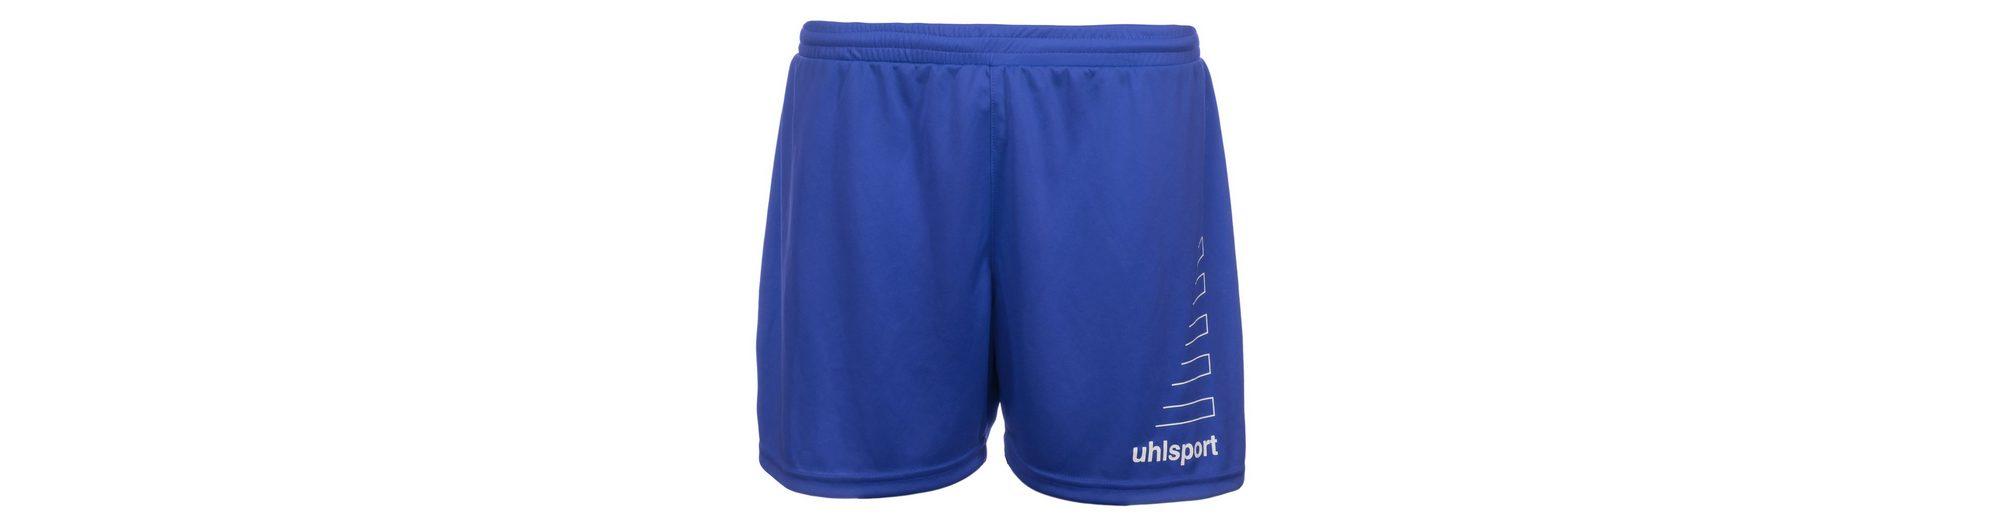 Verkauf Finish Günstig Kaufen Neuesten Kollektionen UHLSPORT Match Team Kit Shortsleeve Damen QdPqlT